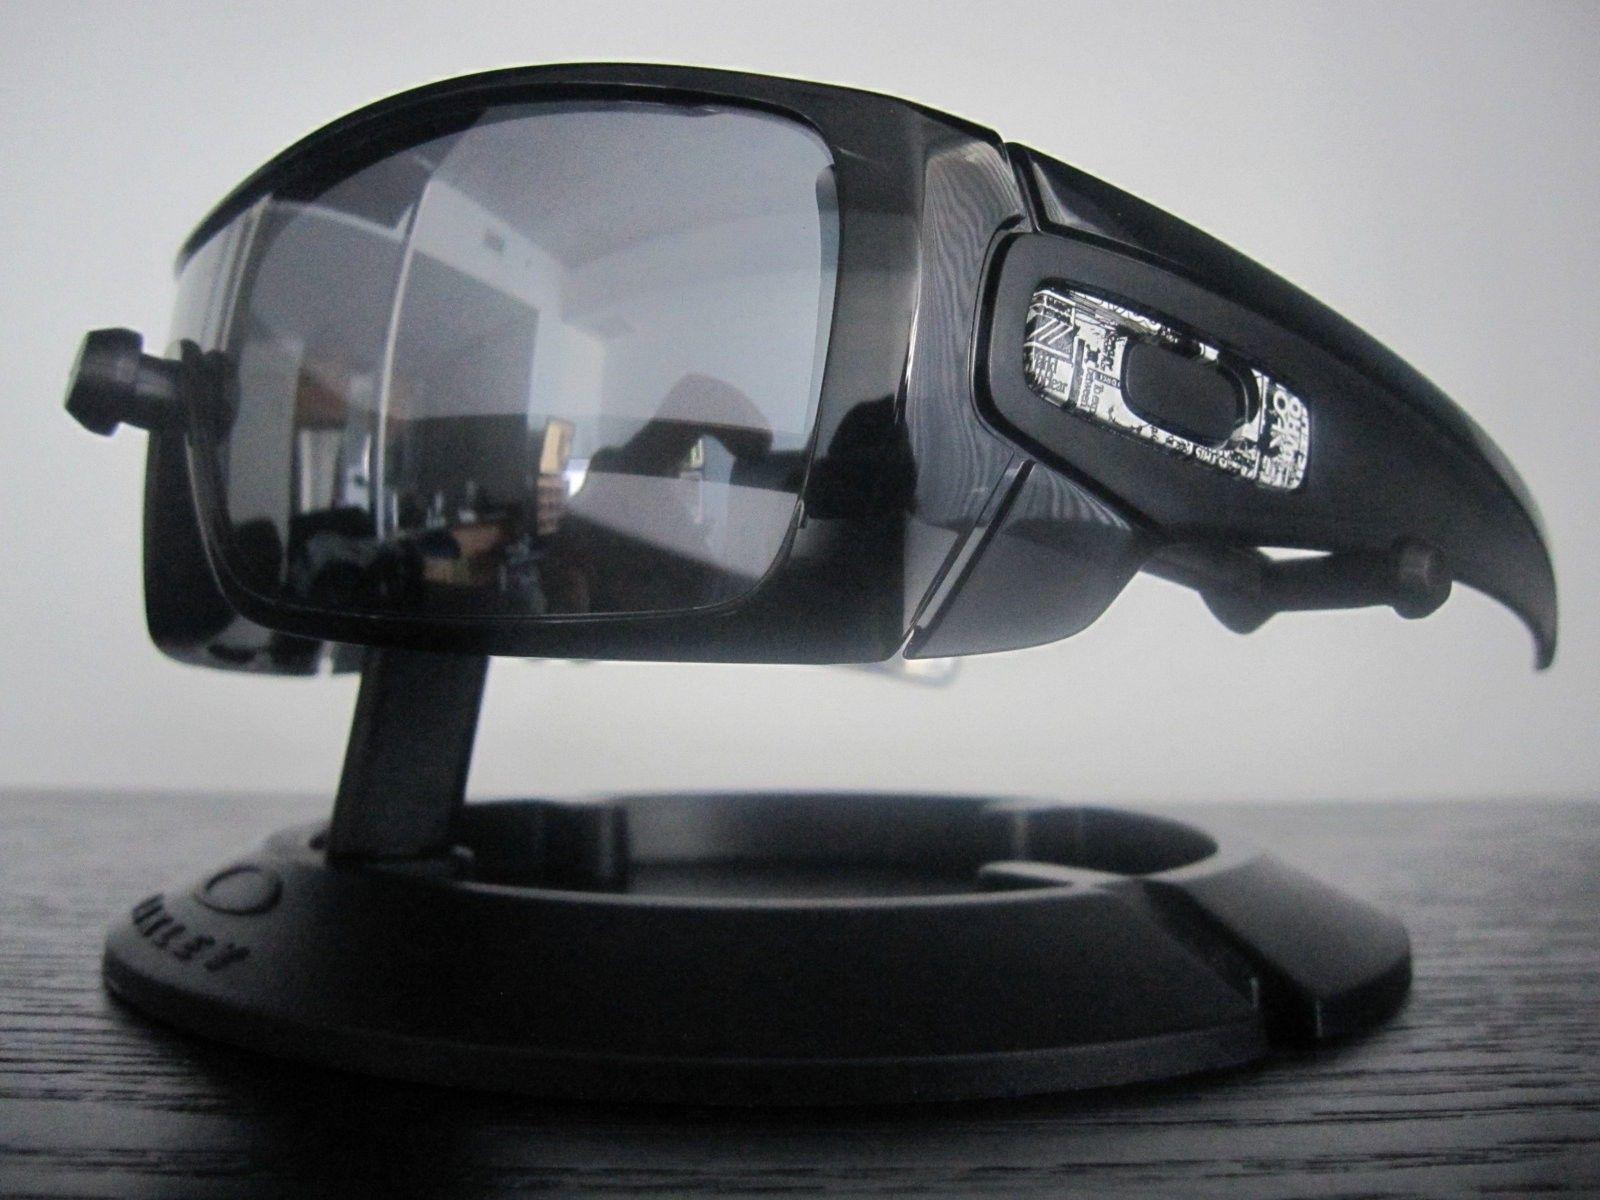 BNIB BATWOLF SKU # 9101-01 - Black Ink / Black Iridium - GONE - IMG_5057.JPG